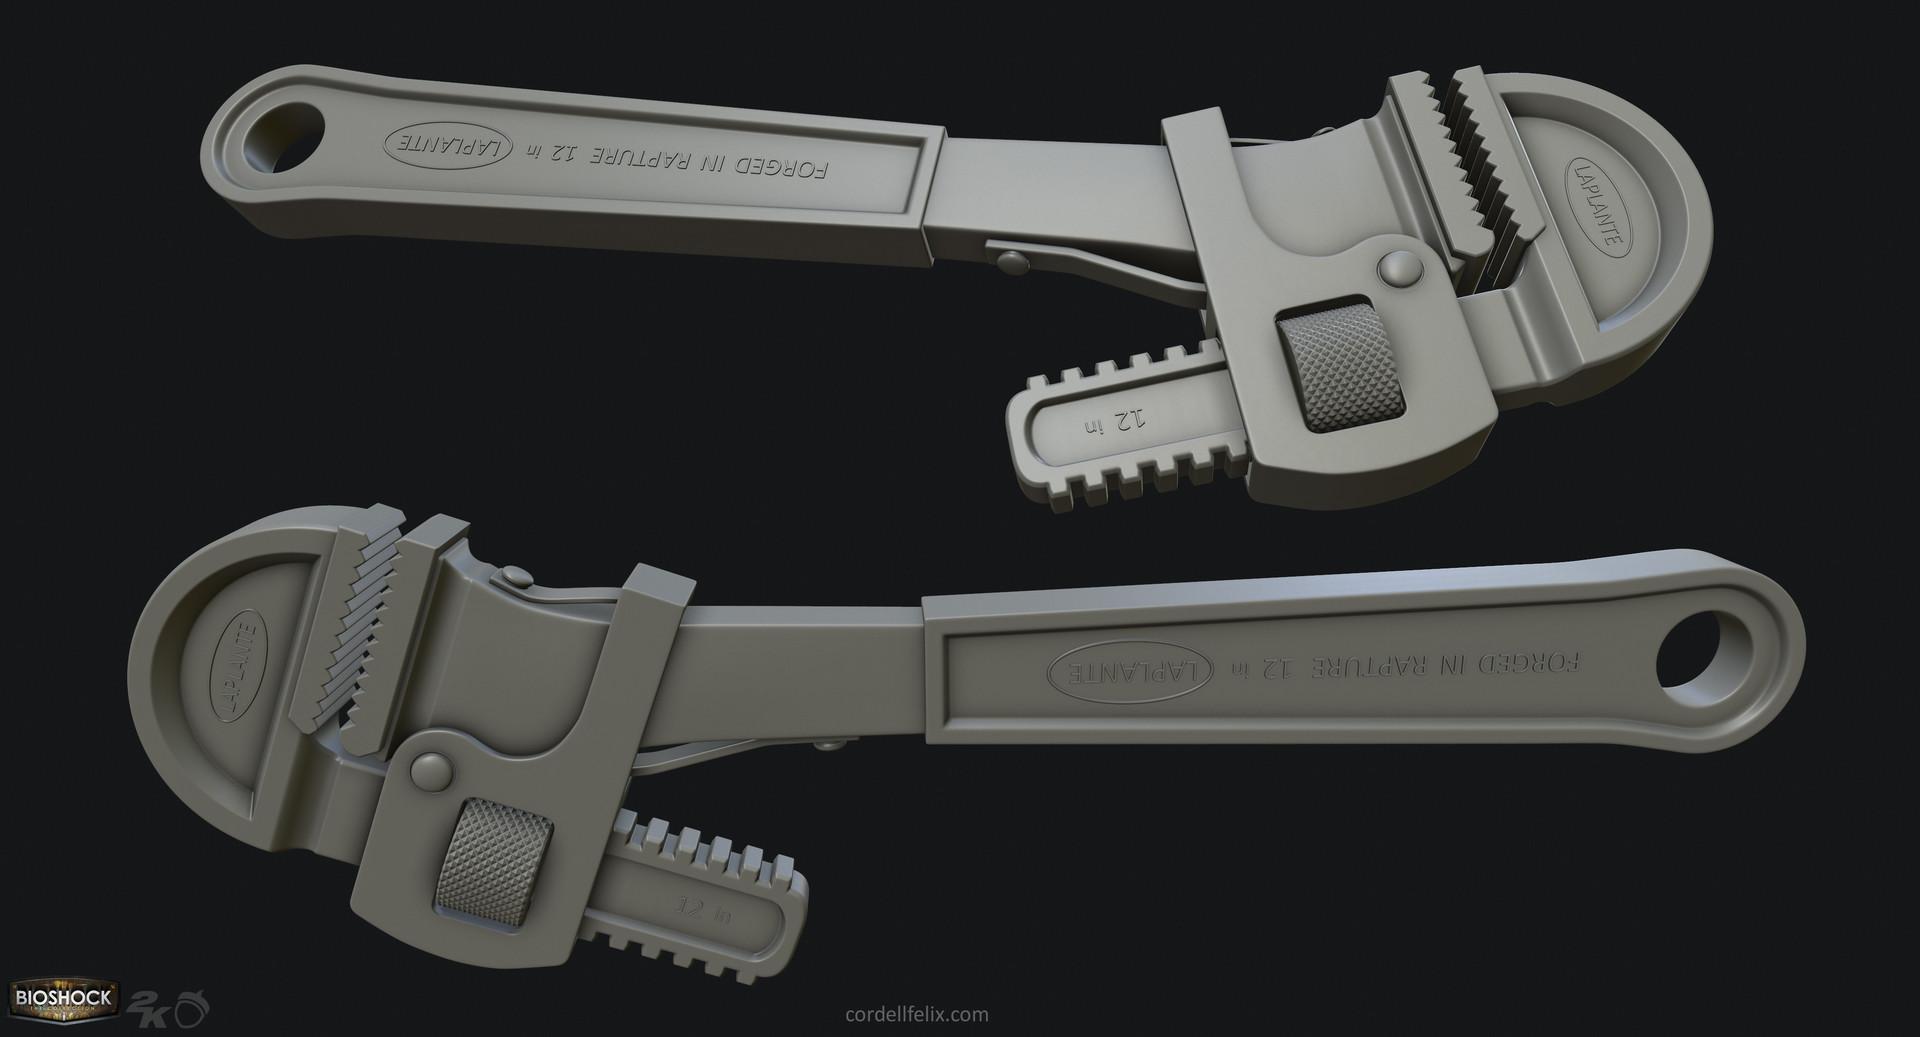 Cordell felix cordellfelix bioshock wrench hp 04